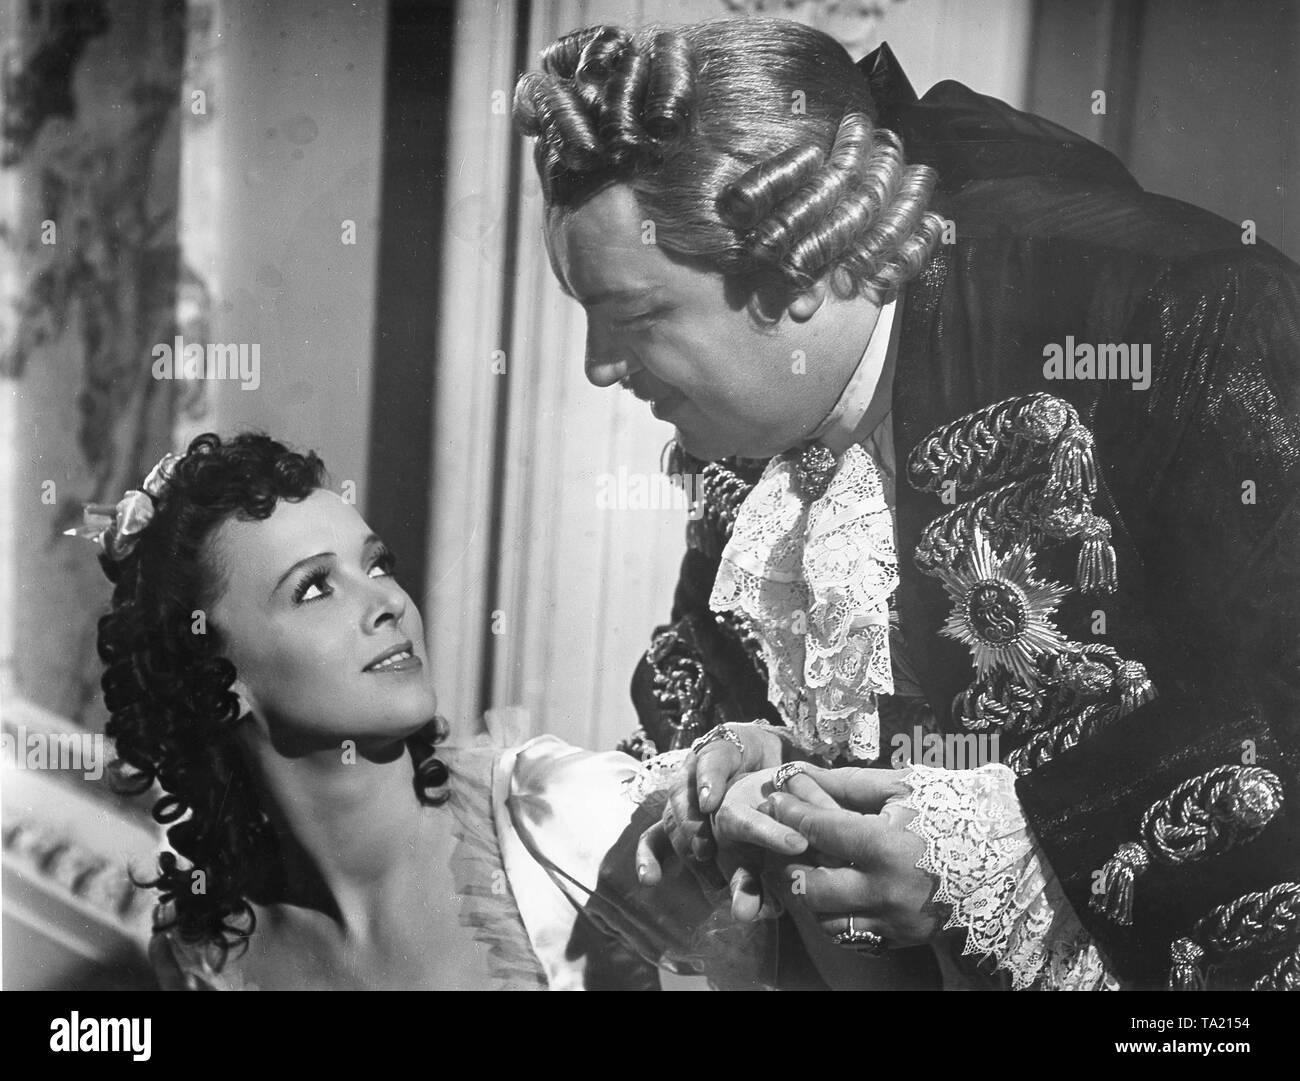 Henry George and Ursula Deinert in the Nazi propaganda film 'Suess the Jew' (Jud Suess) - Stock Image